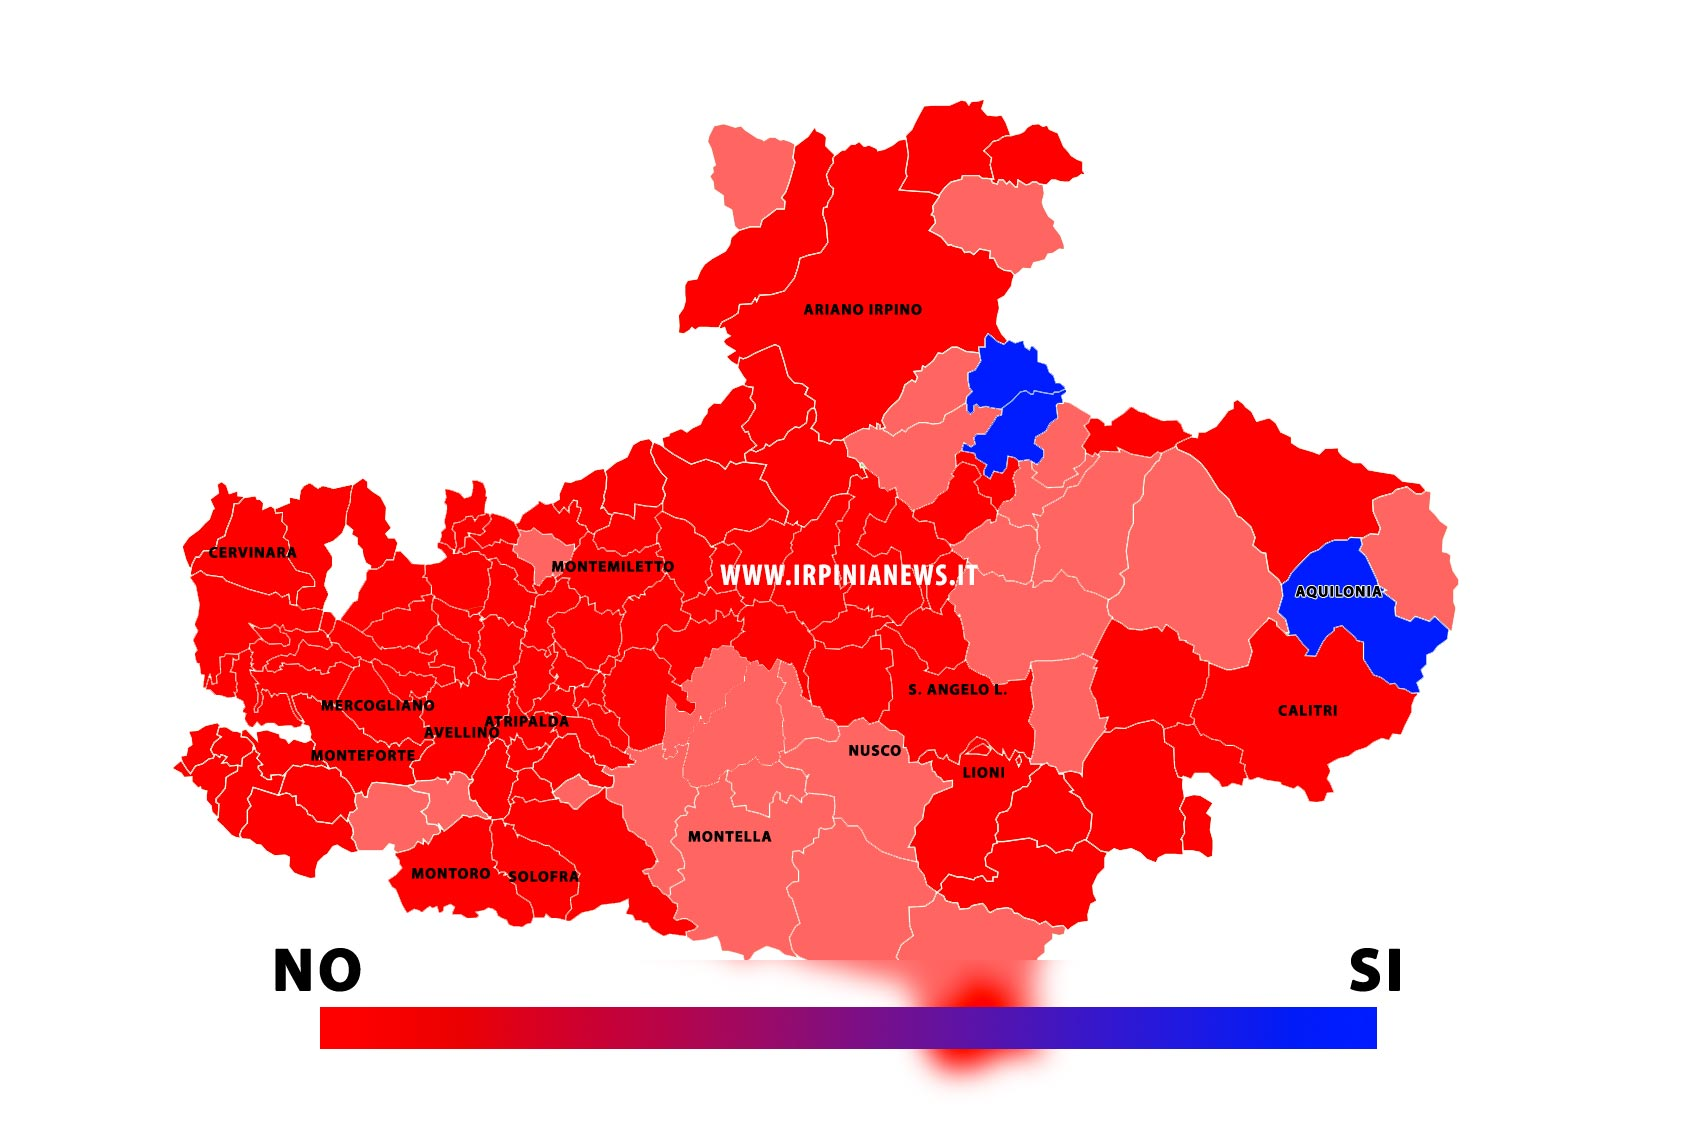 mappa-referendum-avellino-irpinia